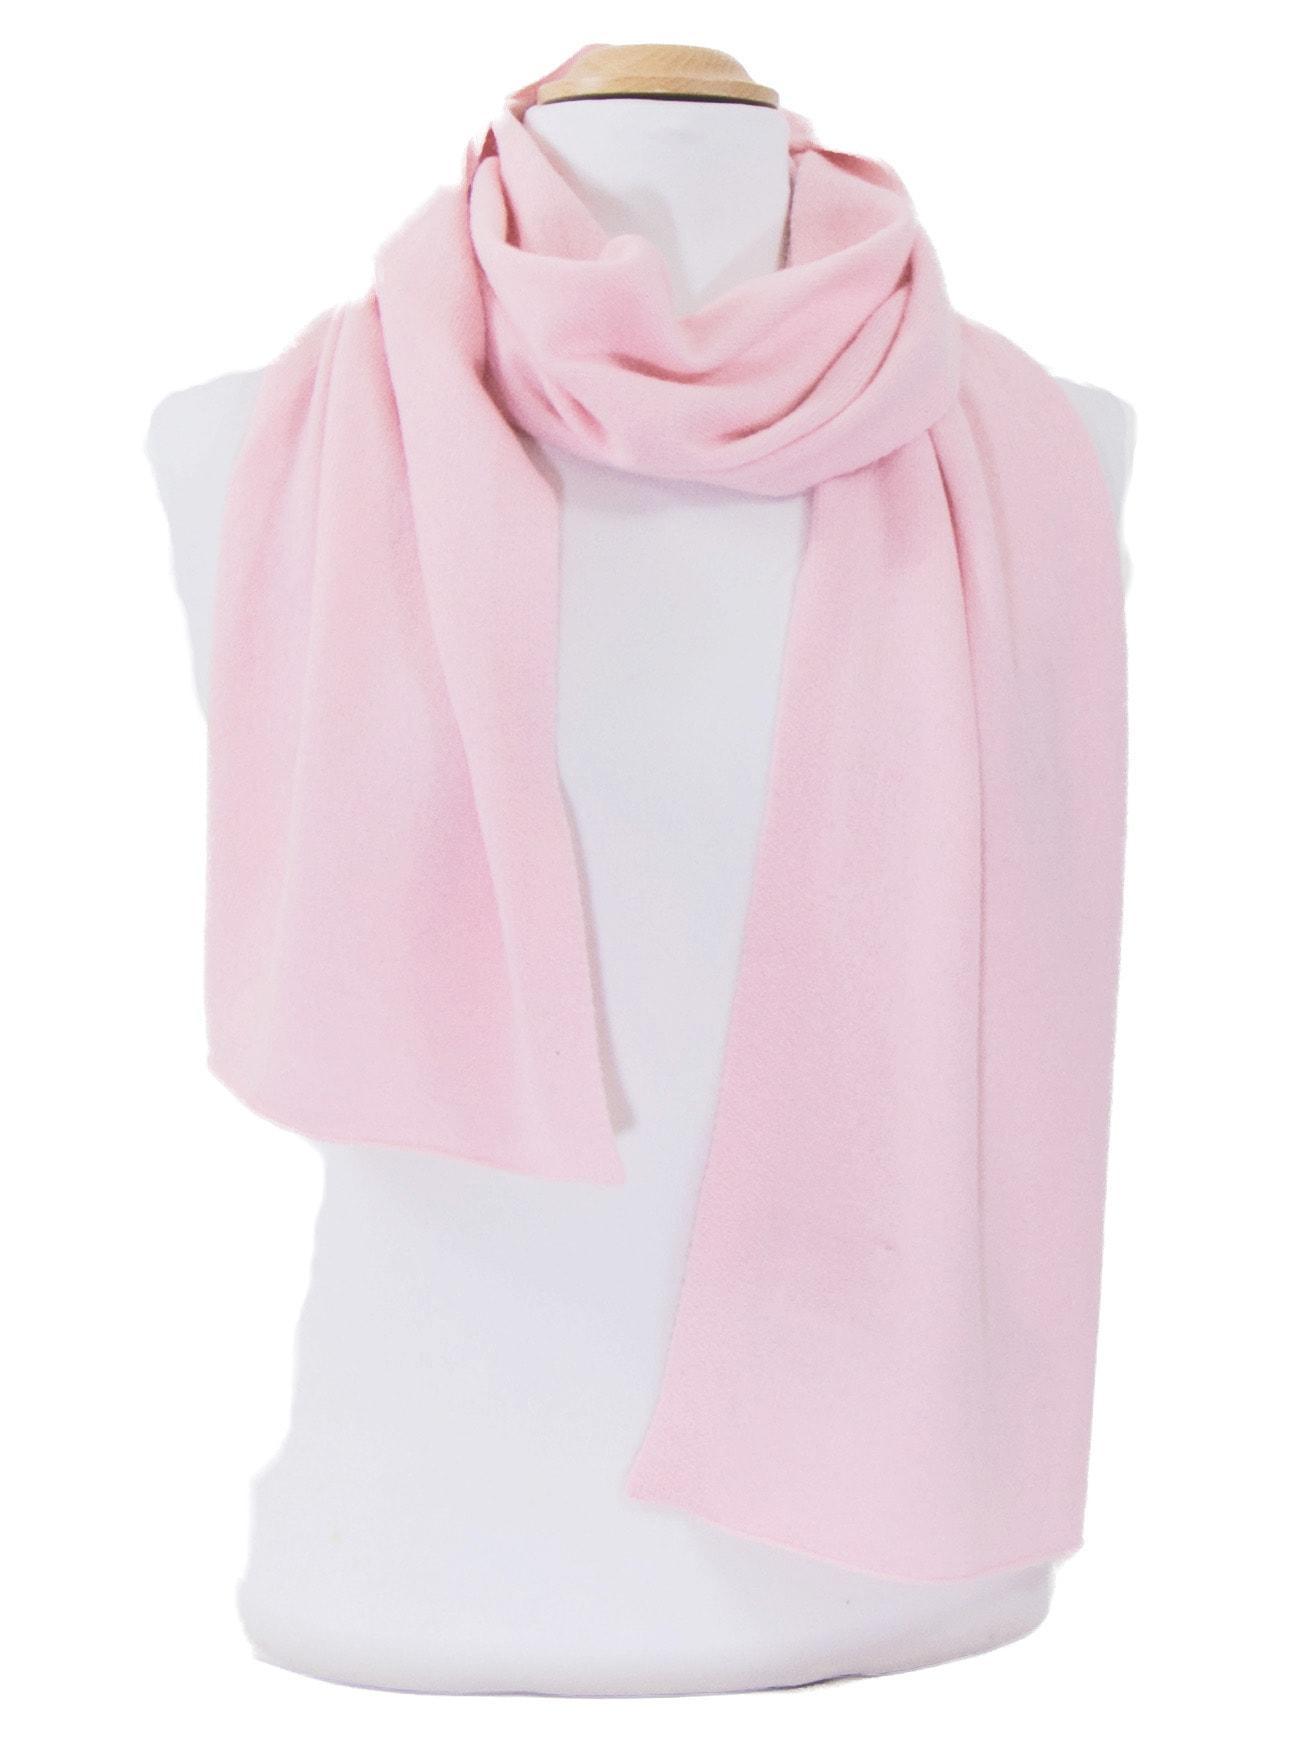 Echarpe rose blush en cachemire J and W - Matière Echarpe cachemire - Mes  Echarpes a210c8cec3e